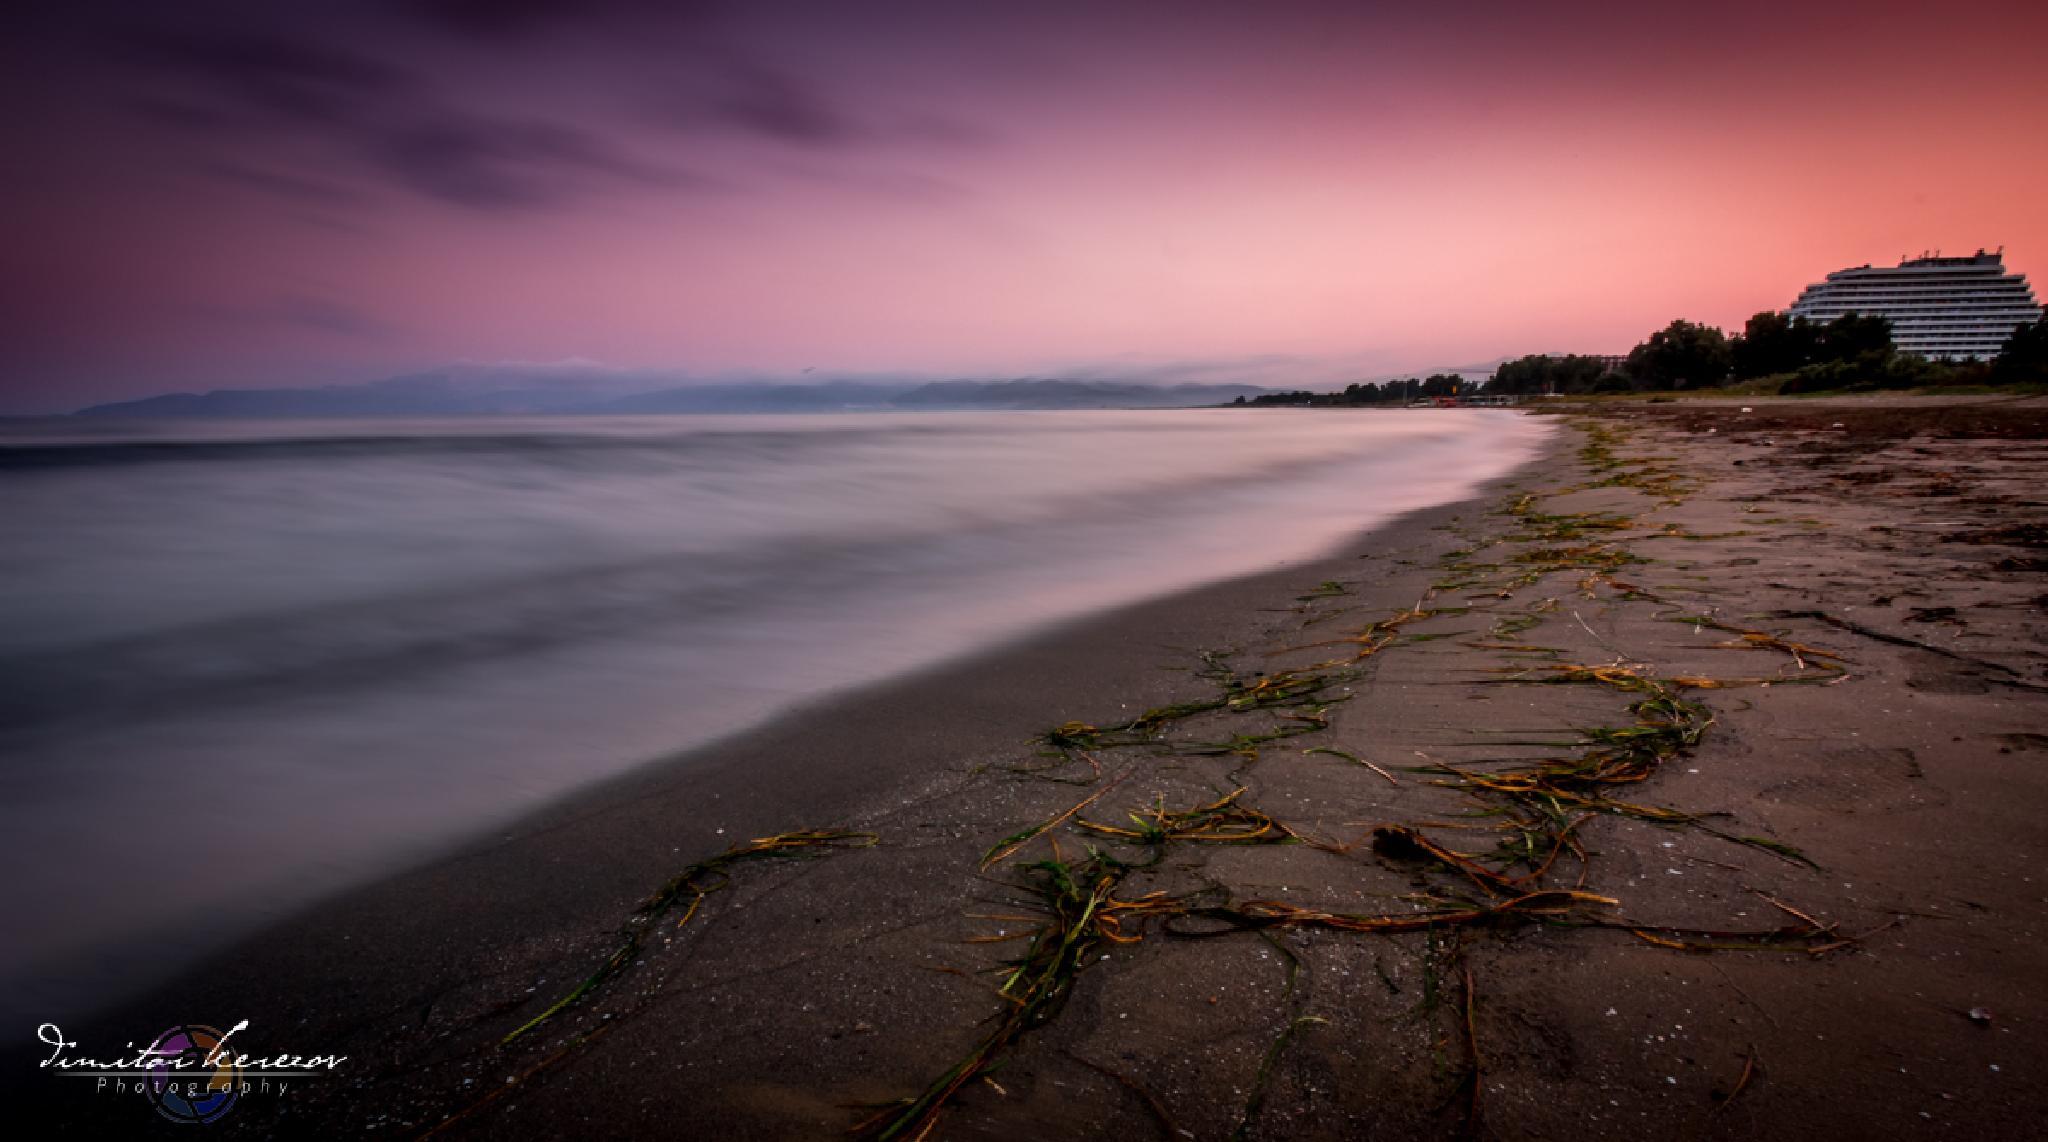 Sunrise in Kusadasi by Dimitar Kerezov